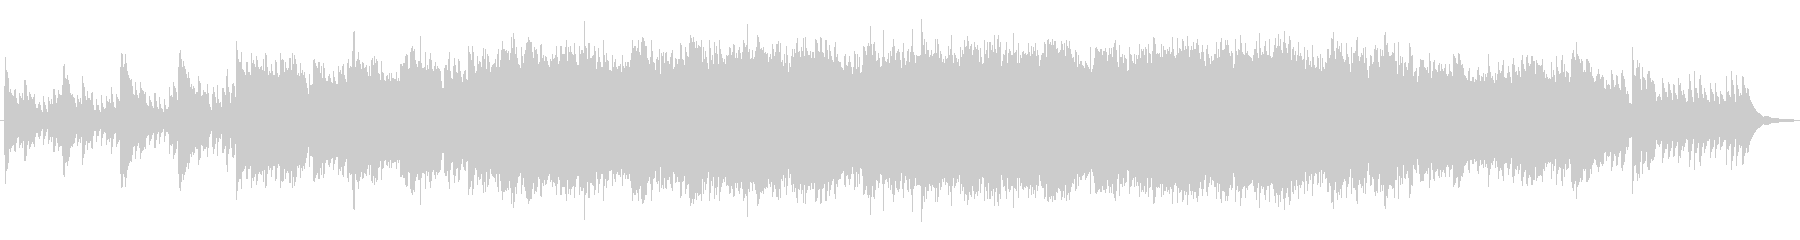 01 ENDING PIANO&TVCMの未再生の波形